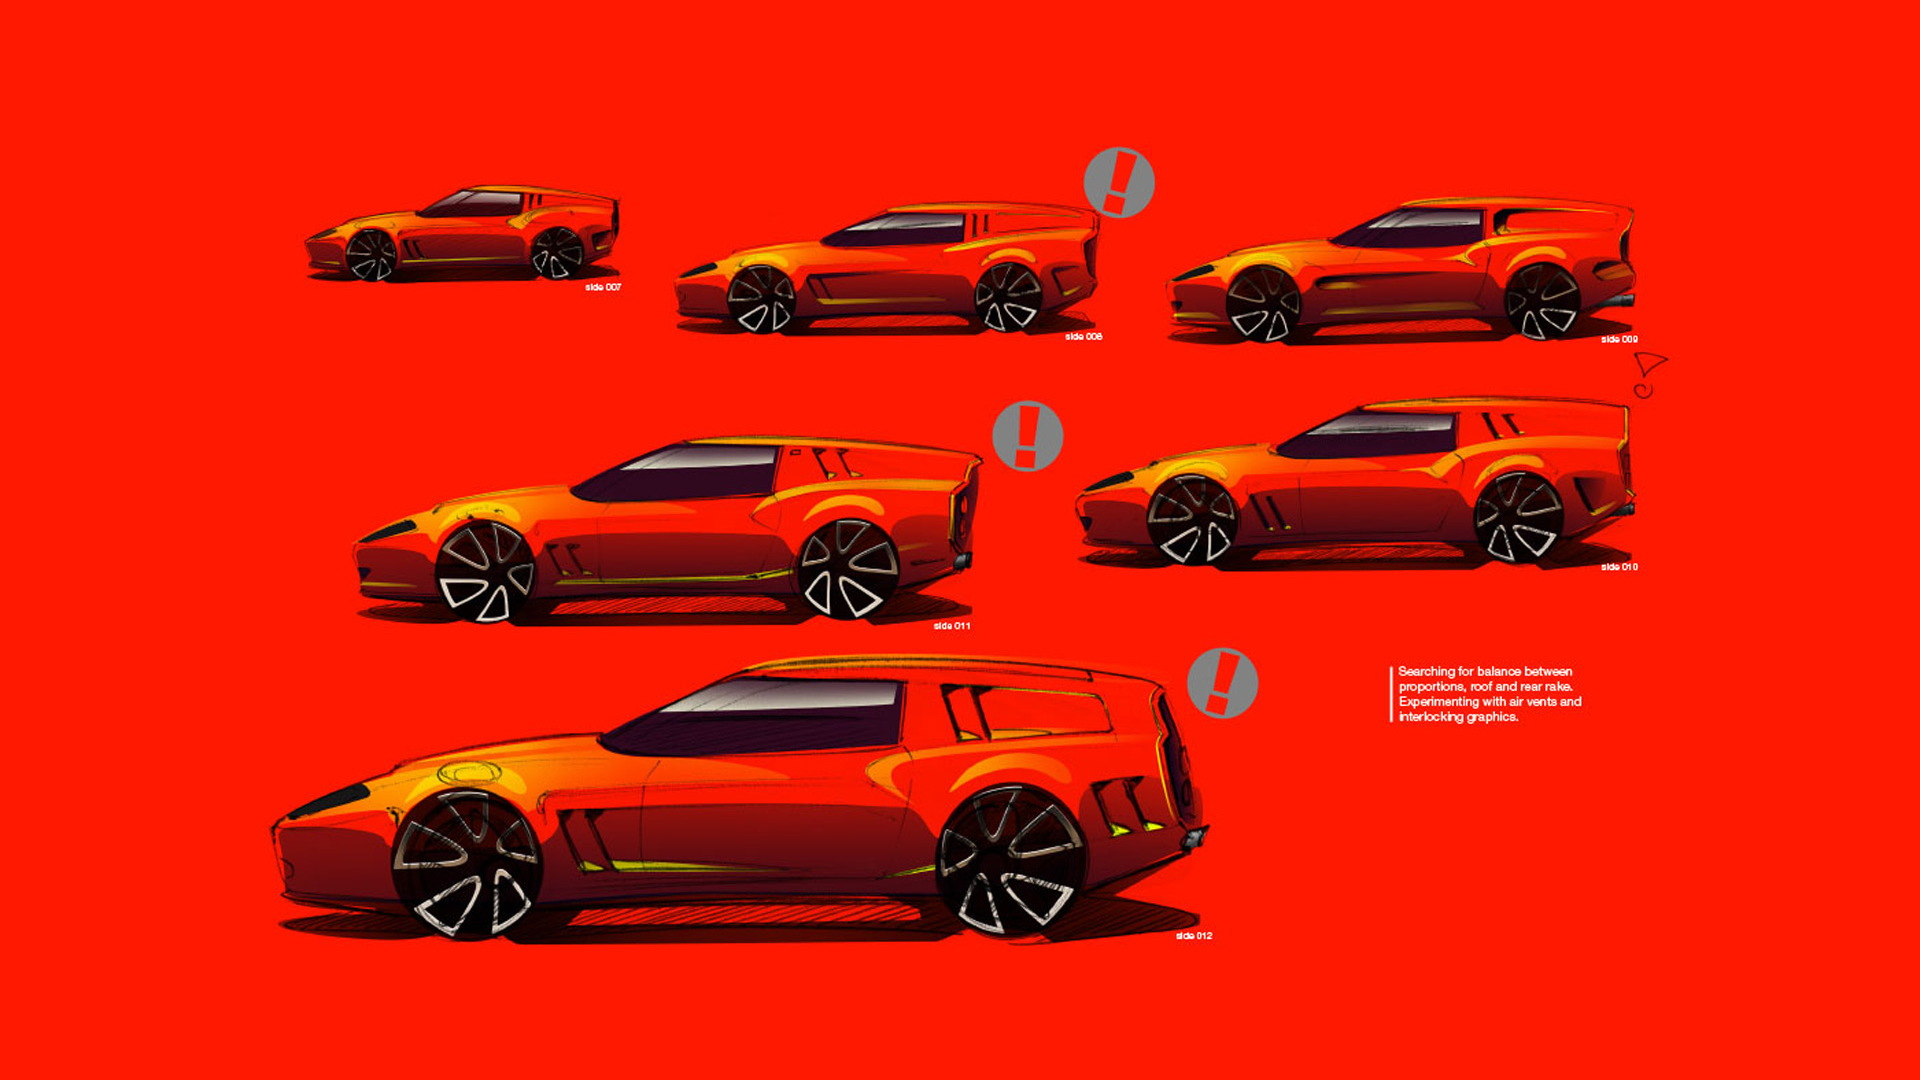 Niels van Roij Design Ferrari 550 Maranello-based Breadvan homage model